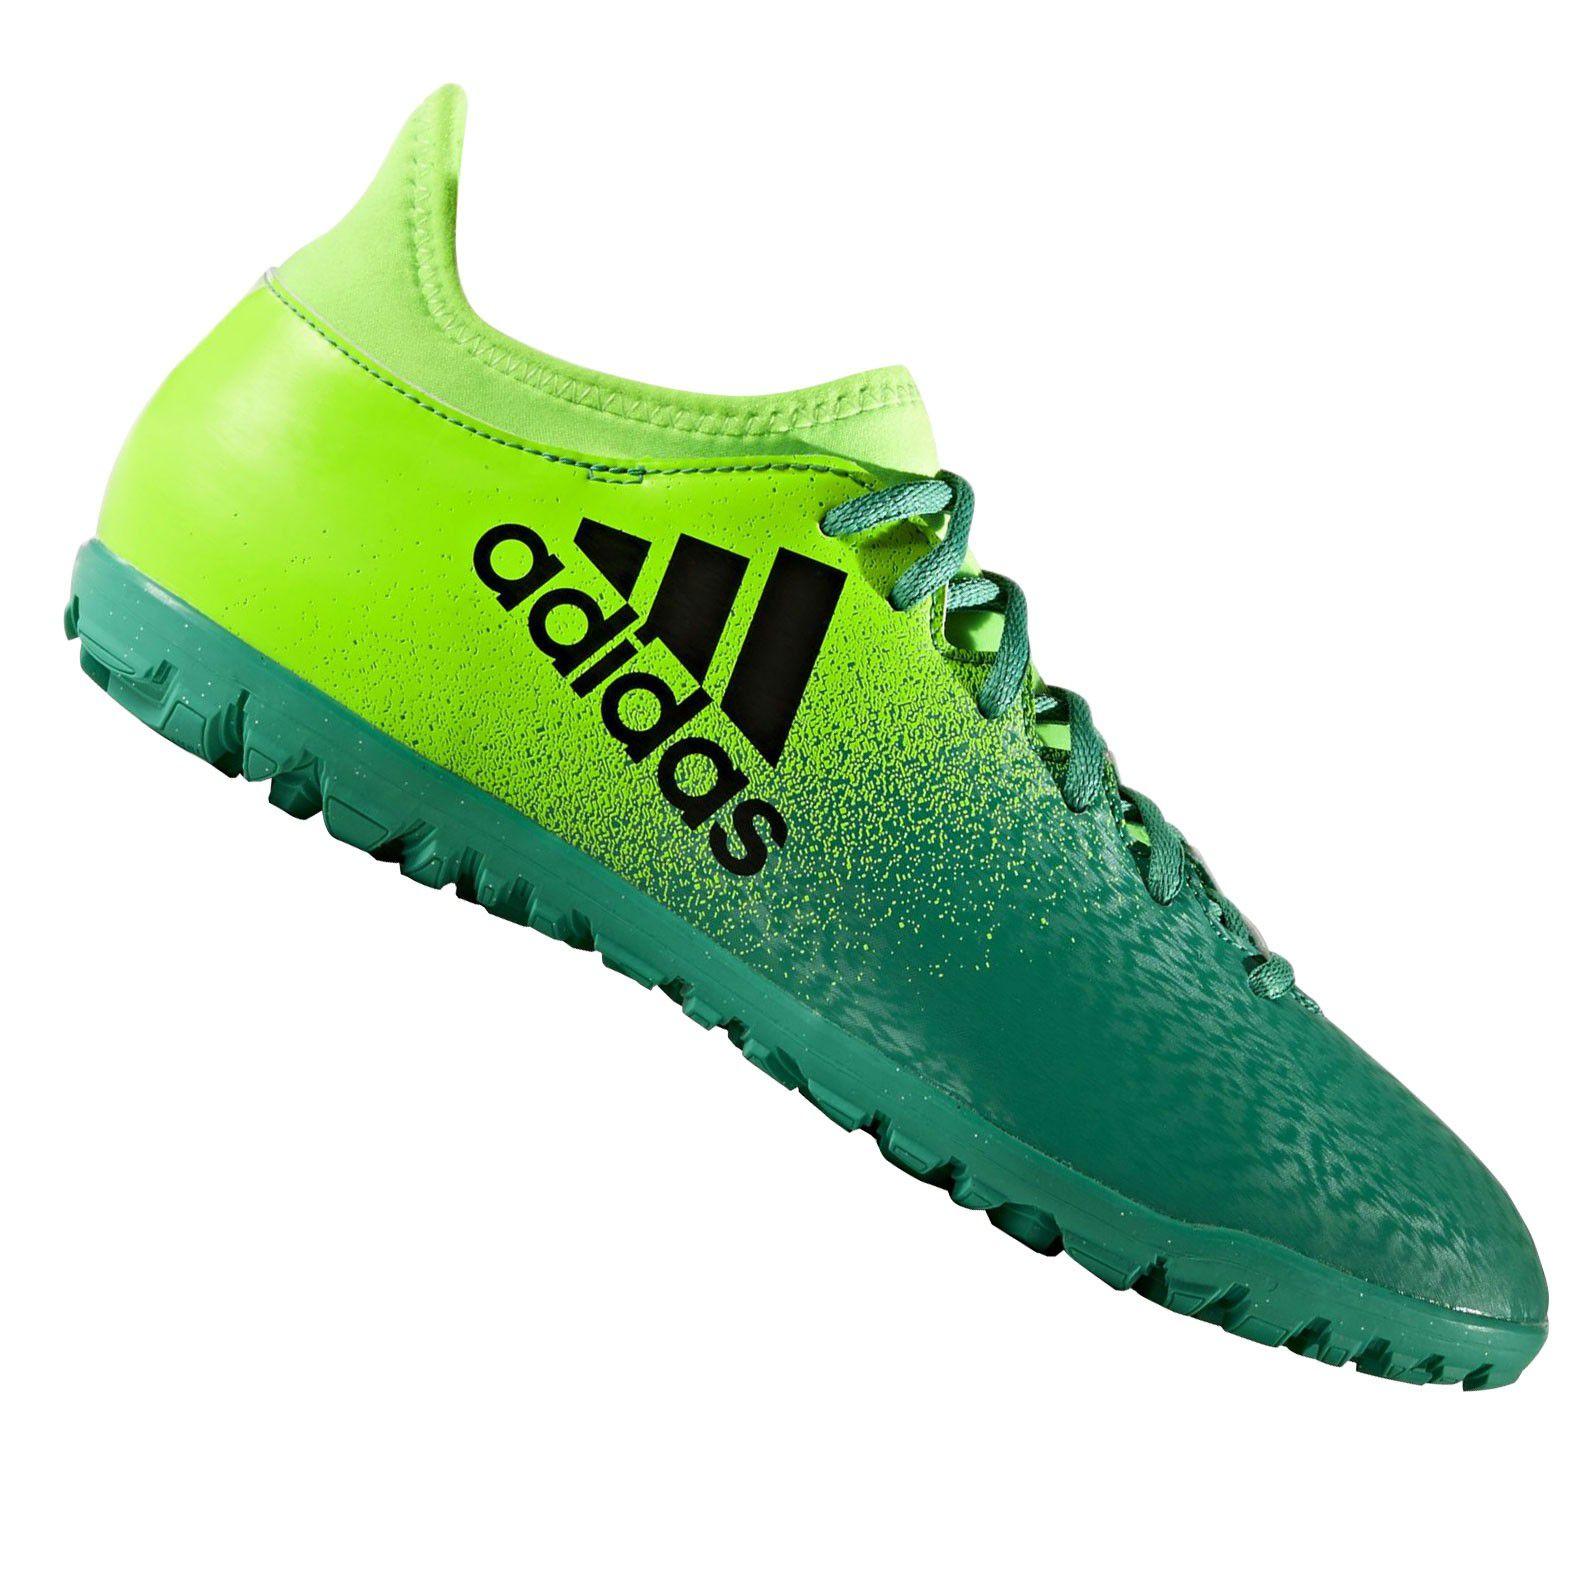 Chuteira Adidas X 16.3 Society